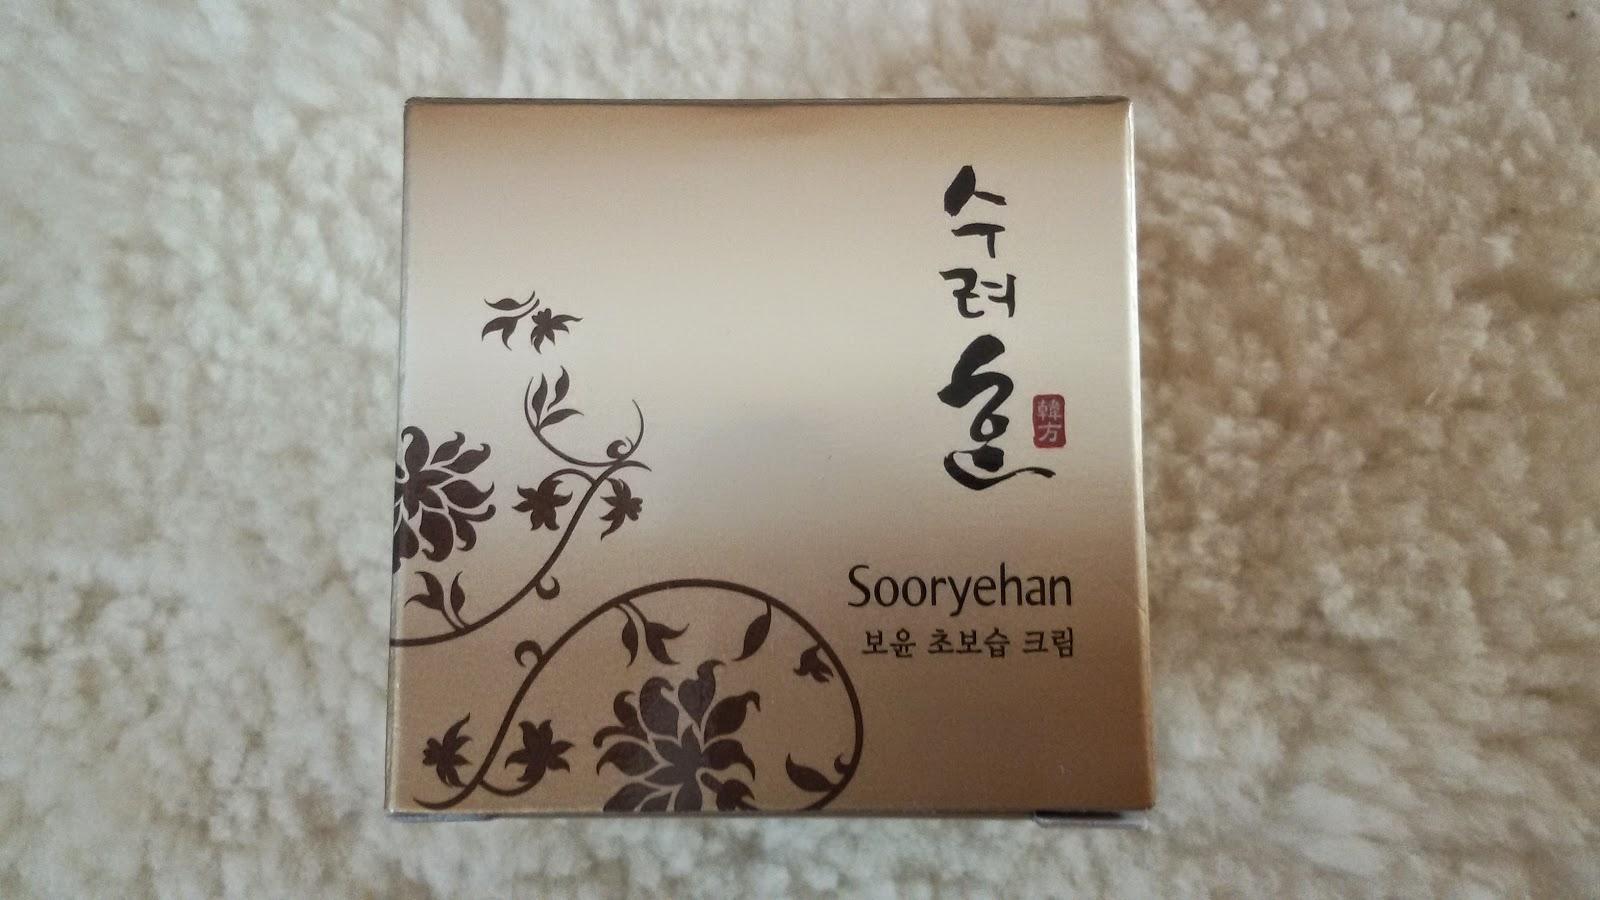 Sooryehan Boyun Extra Moisturizing Cream